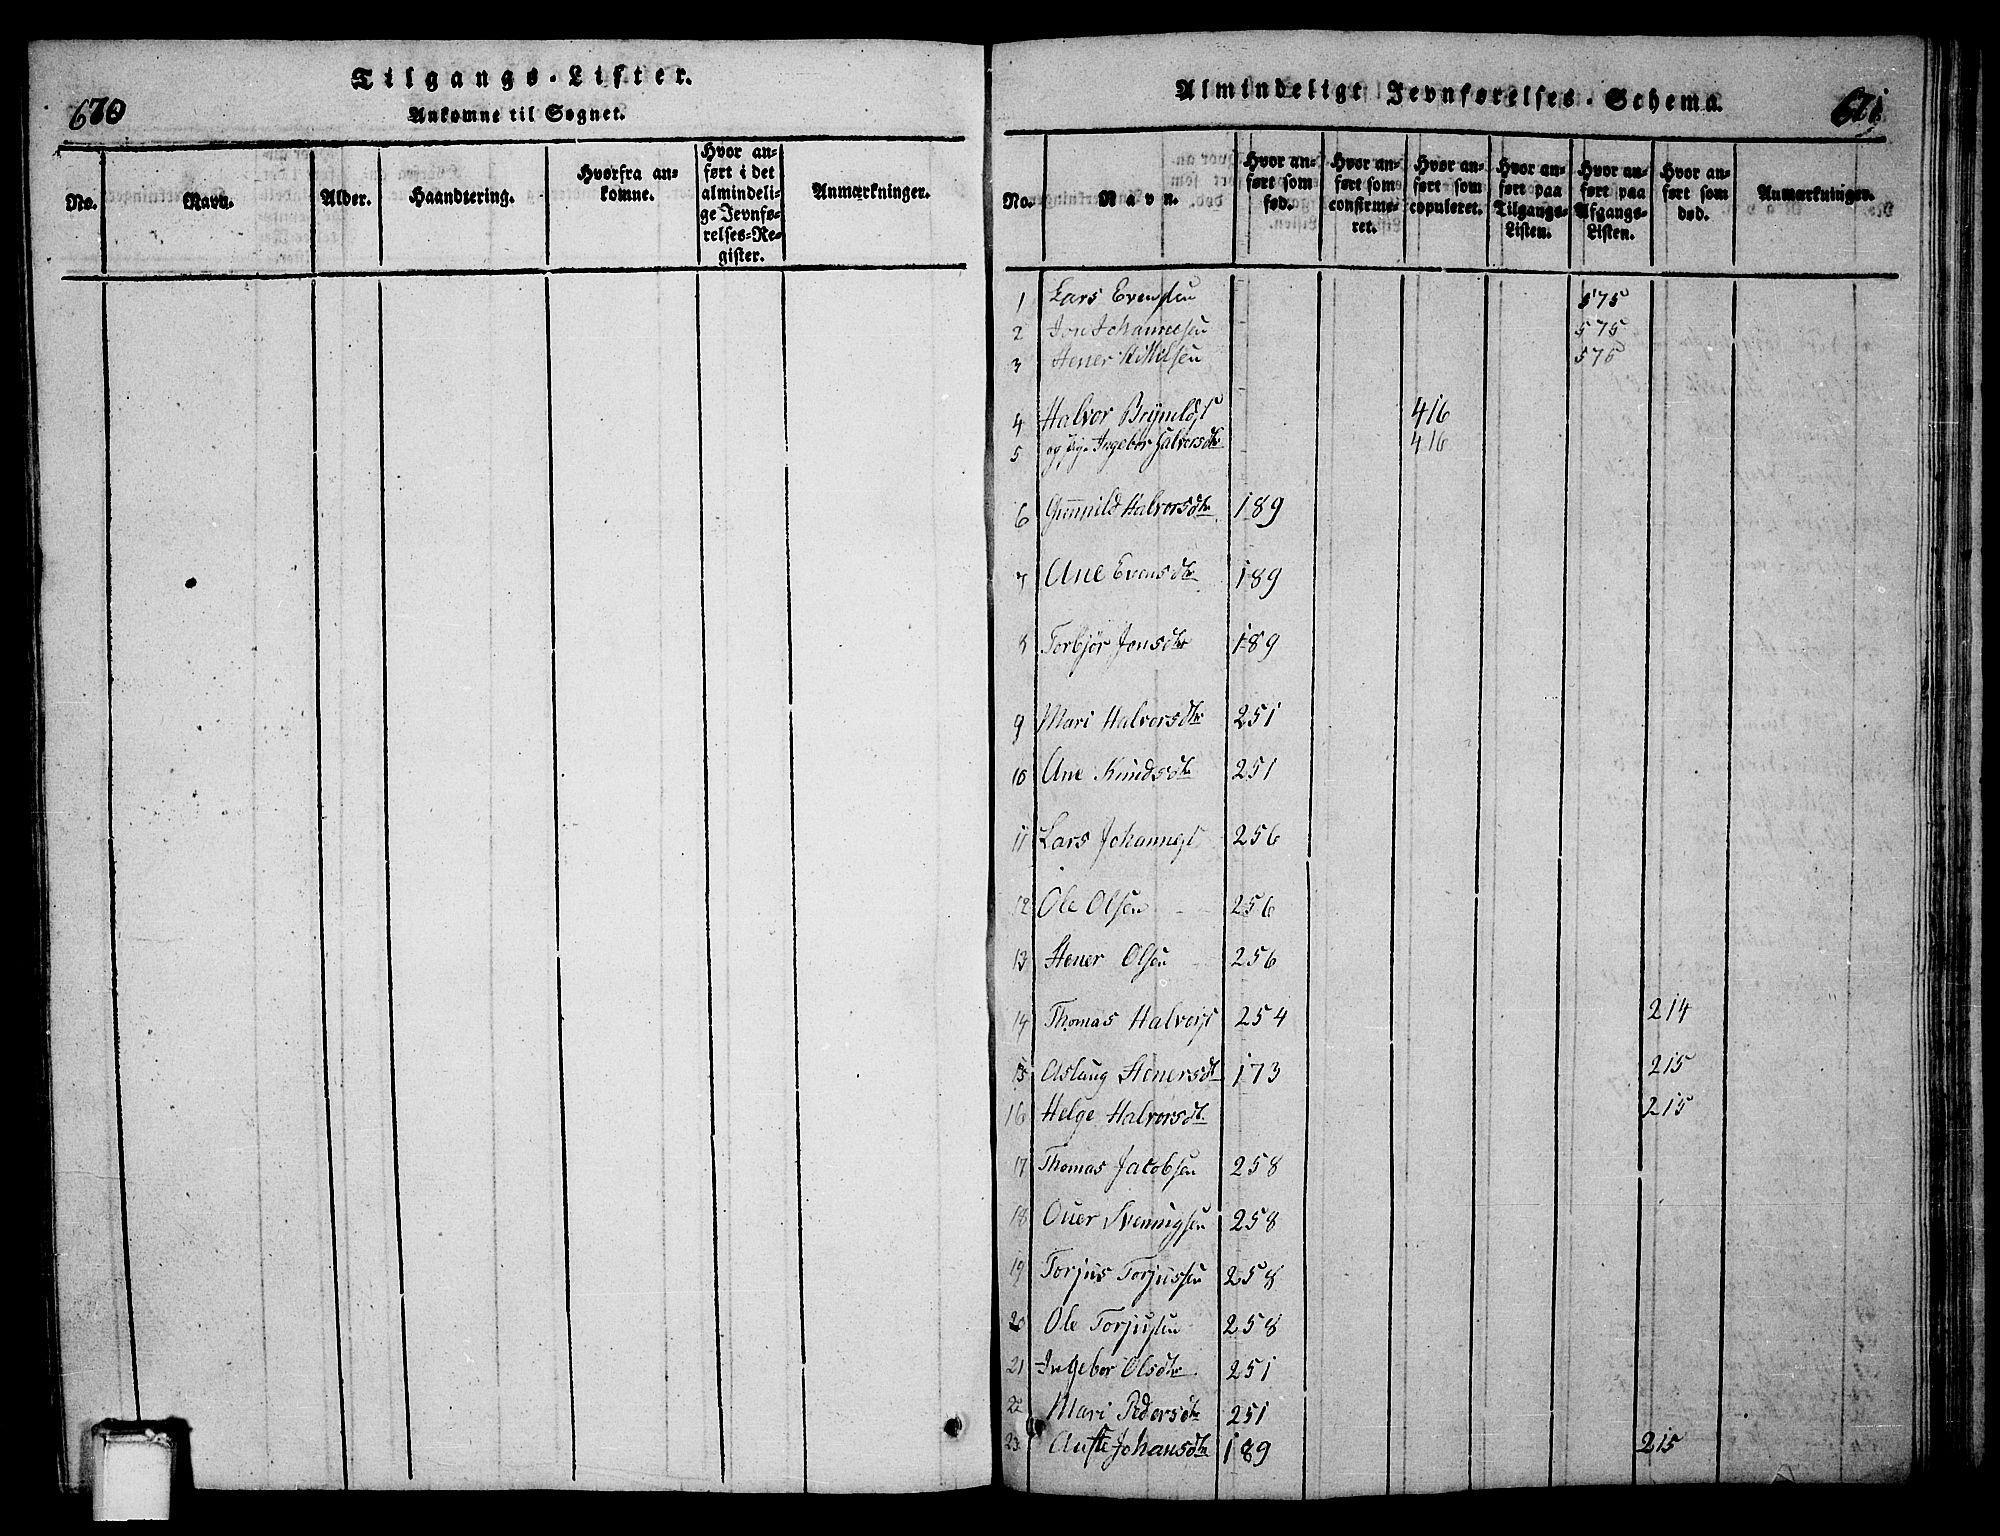 SAKO, Bø kirkebøker, G/Ga/L0001: Klokkerbok nr. 1, 1815-1831, s. 670-671